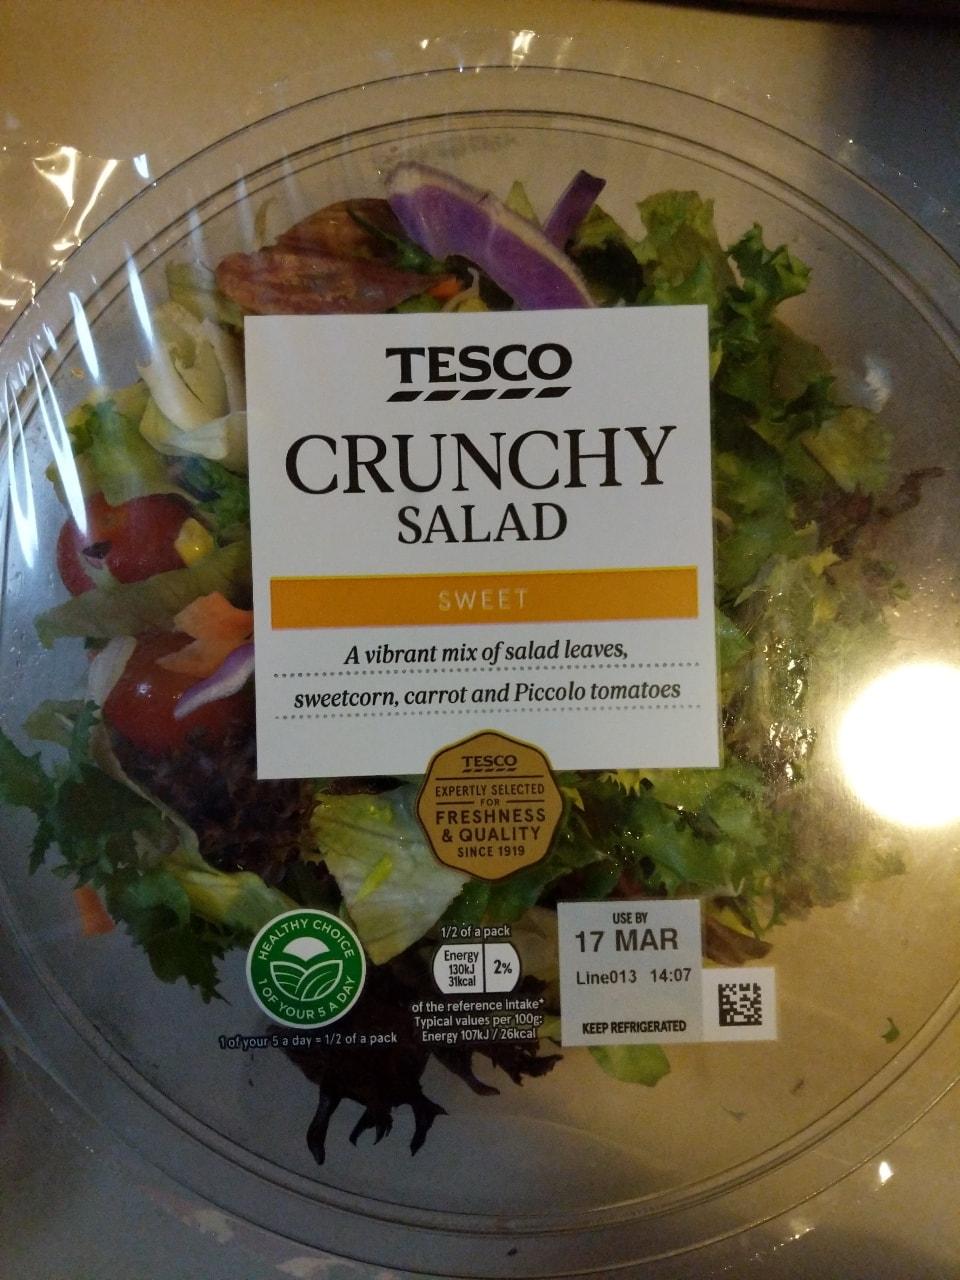 Large crunchy salad